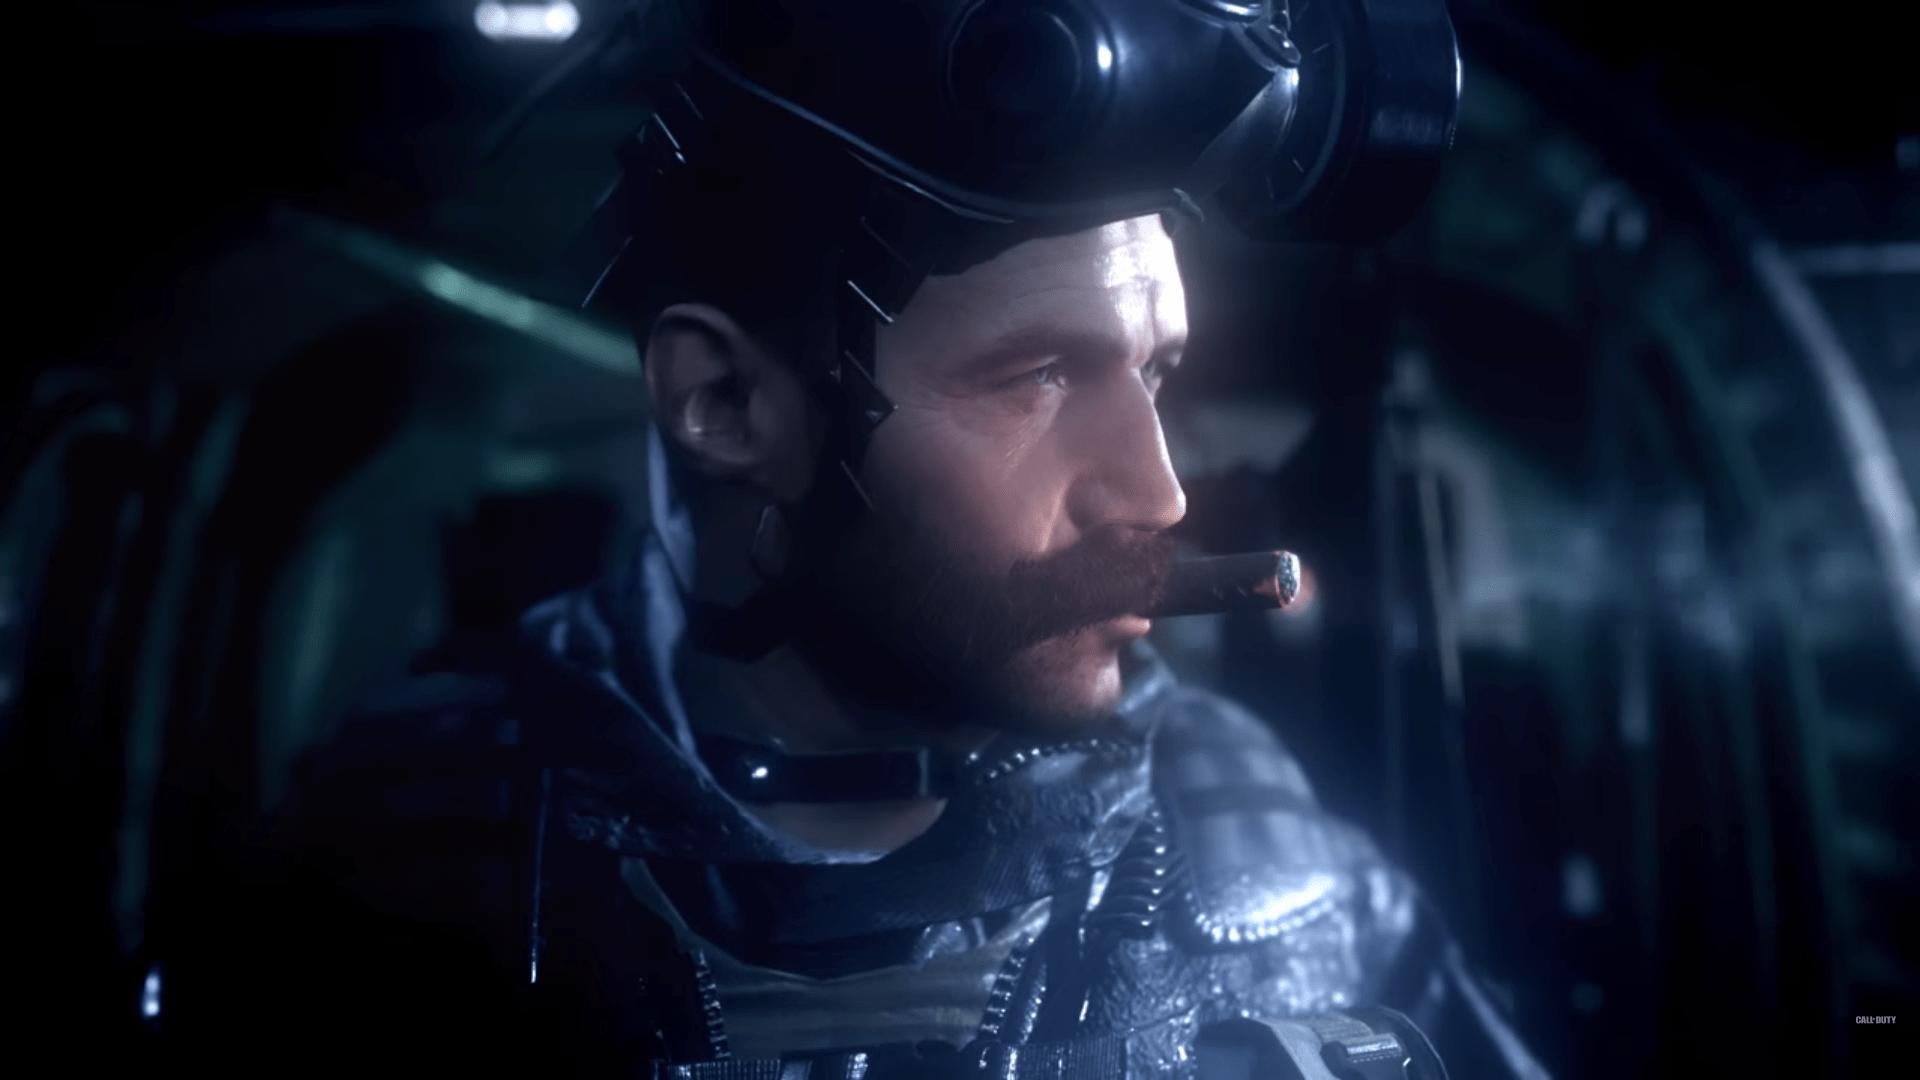 Gta 5 Wallpaper Hd 1080p Call Of Duty Infinite Warfare And Modern Warfare